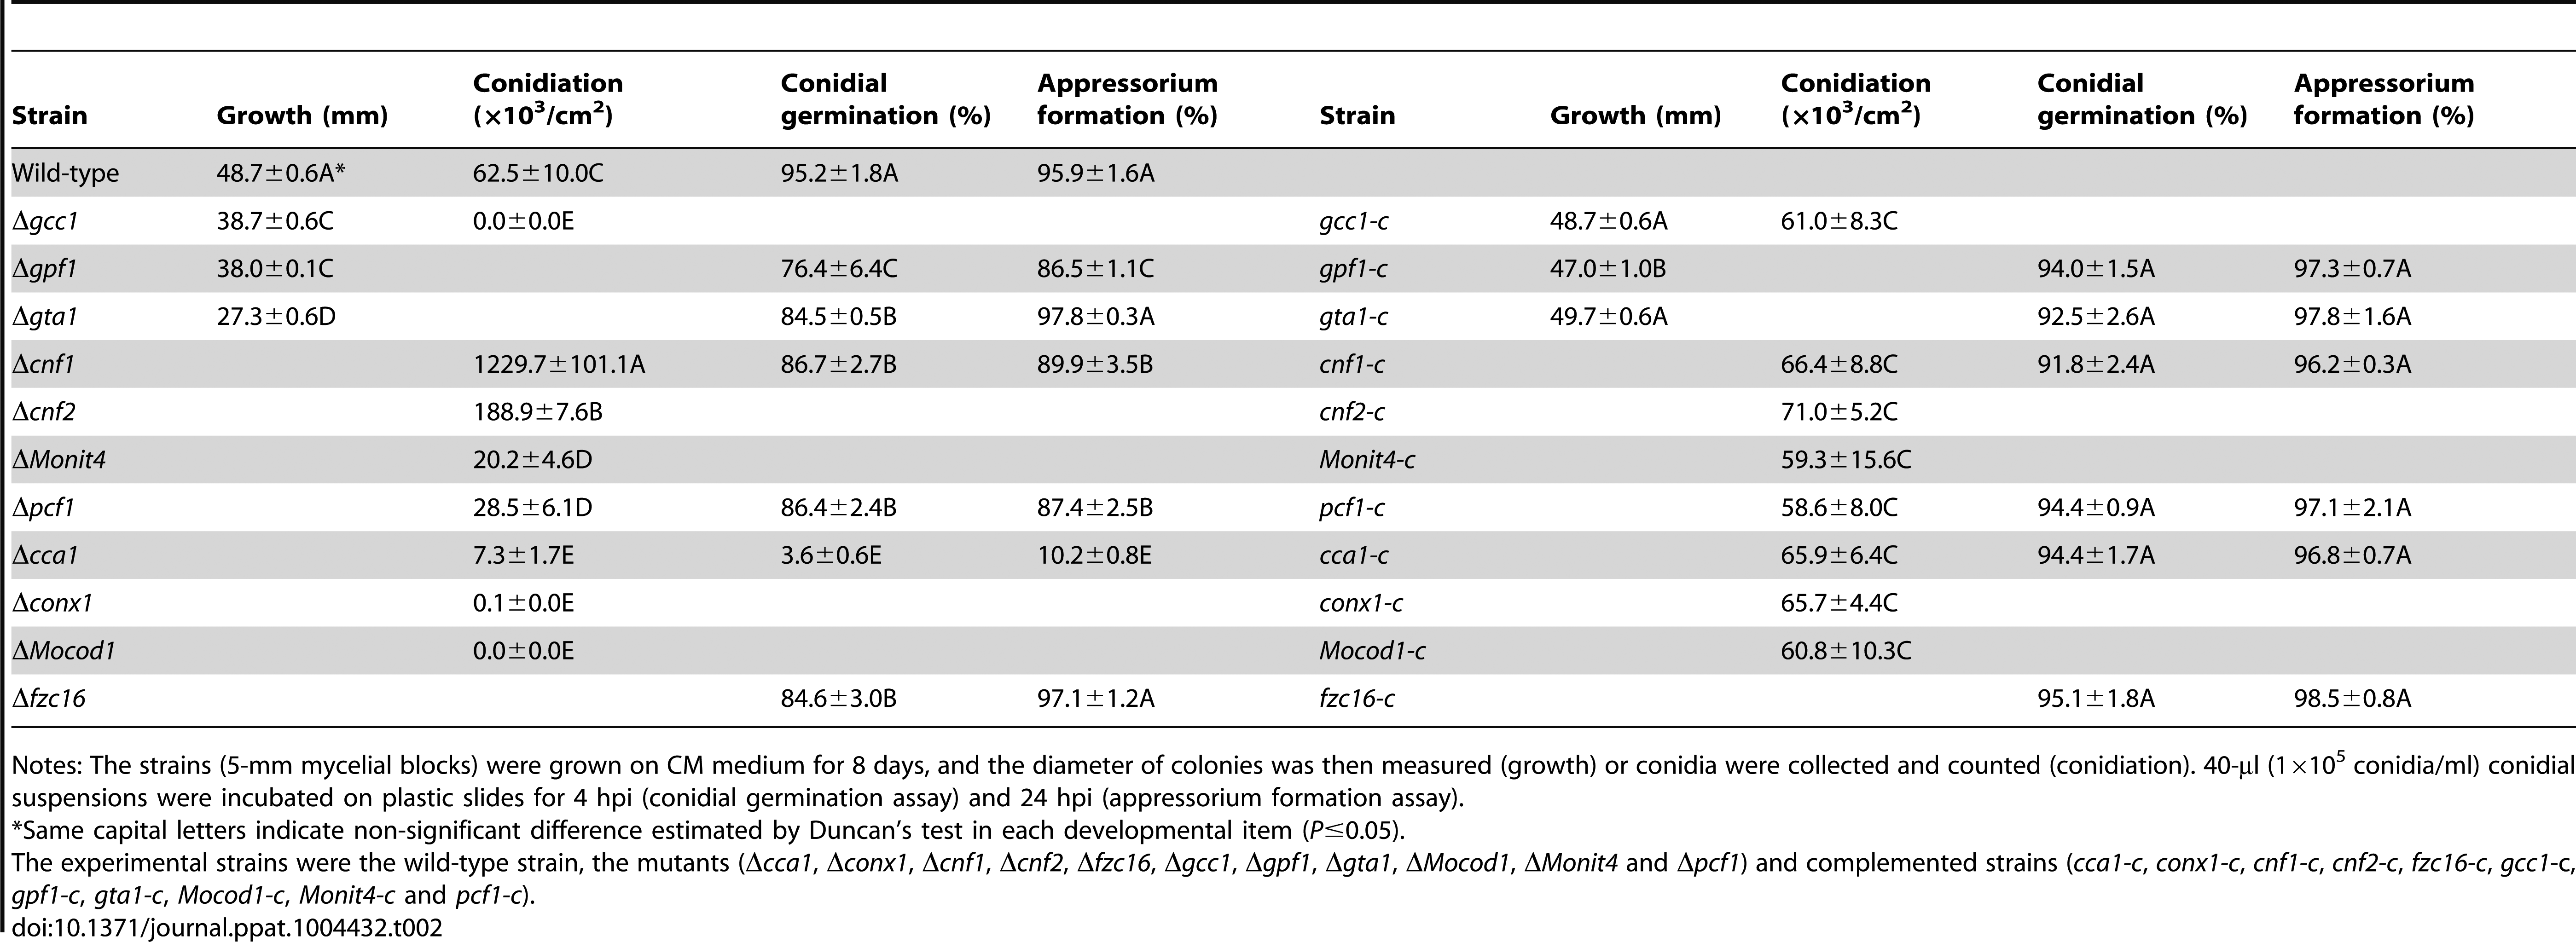 Developmental characteristics of <i>M. oryzae</i> strains.